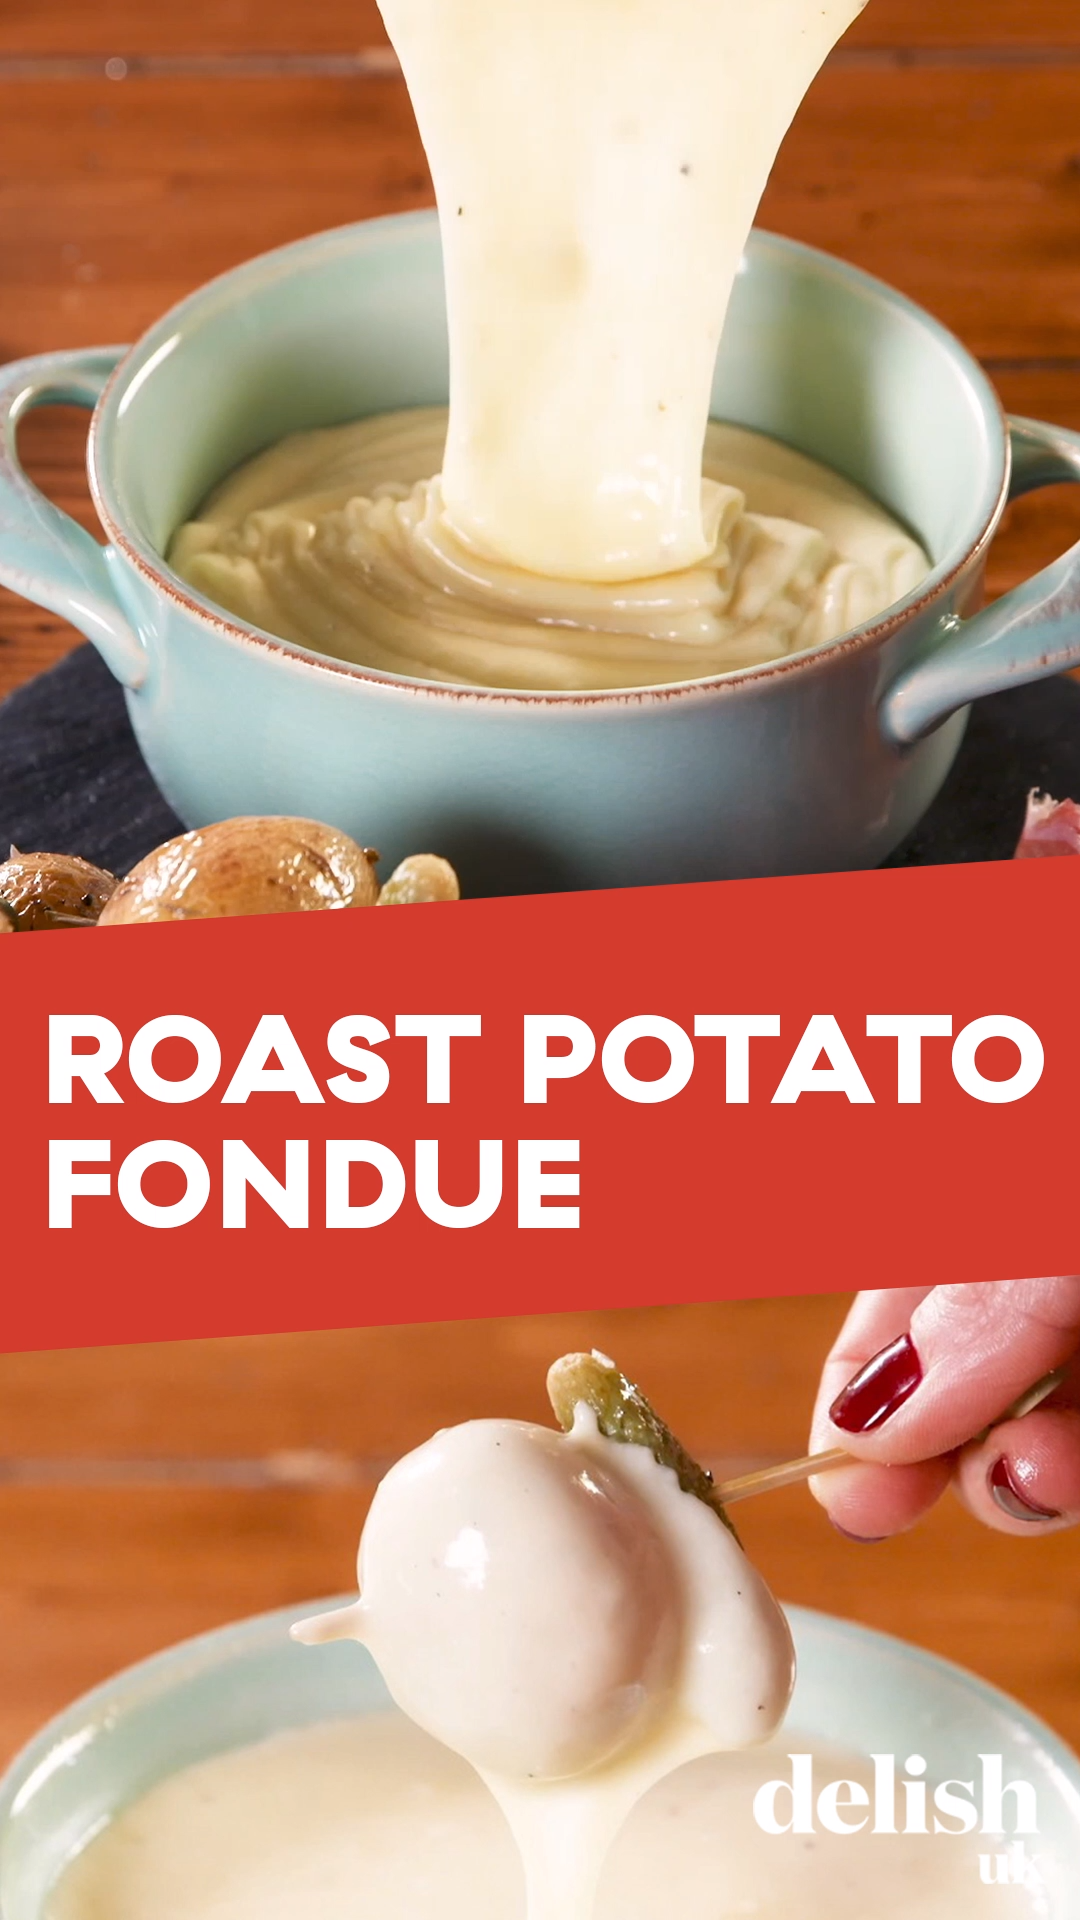 Roast Potato Fondue